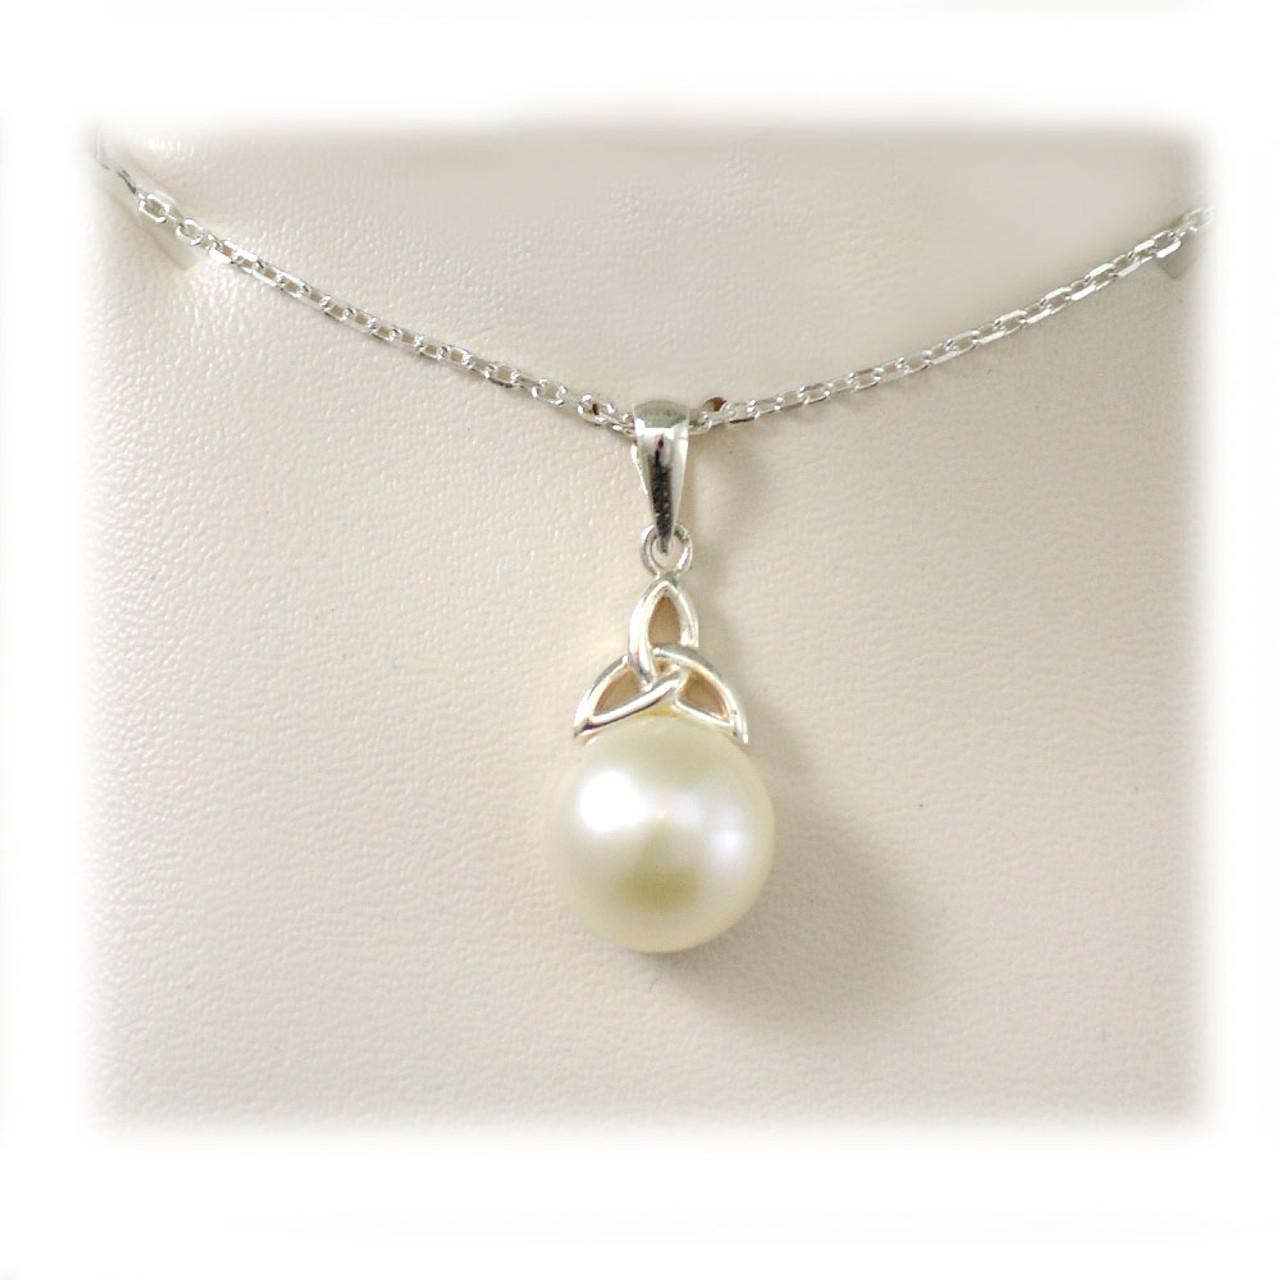 Failte Pearl & Trinity Knot Pendant